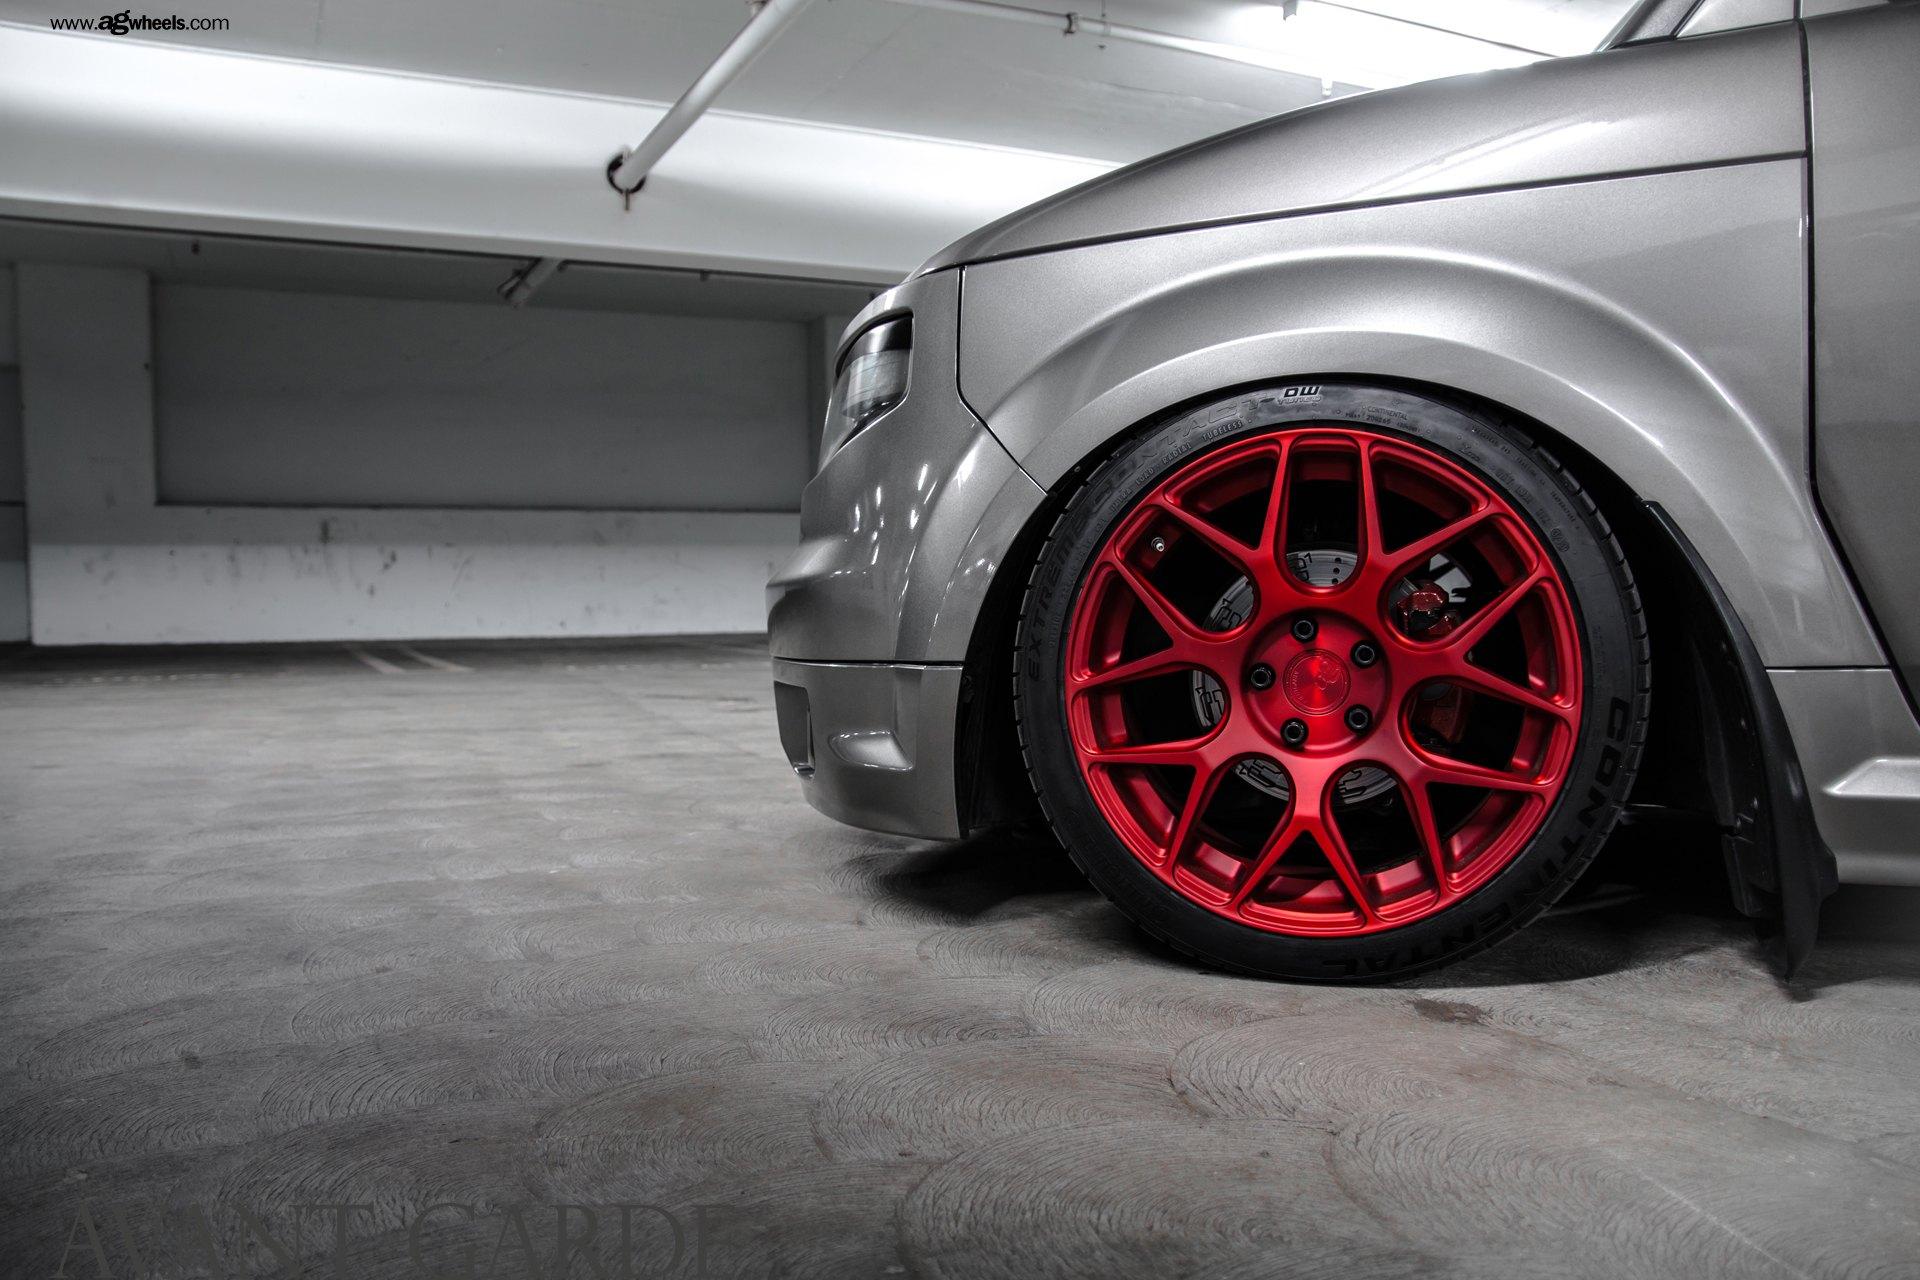 Matte Red Avant Garde Rims on Gray Honda Element - Photo by Avant Garde  Wheels